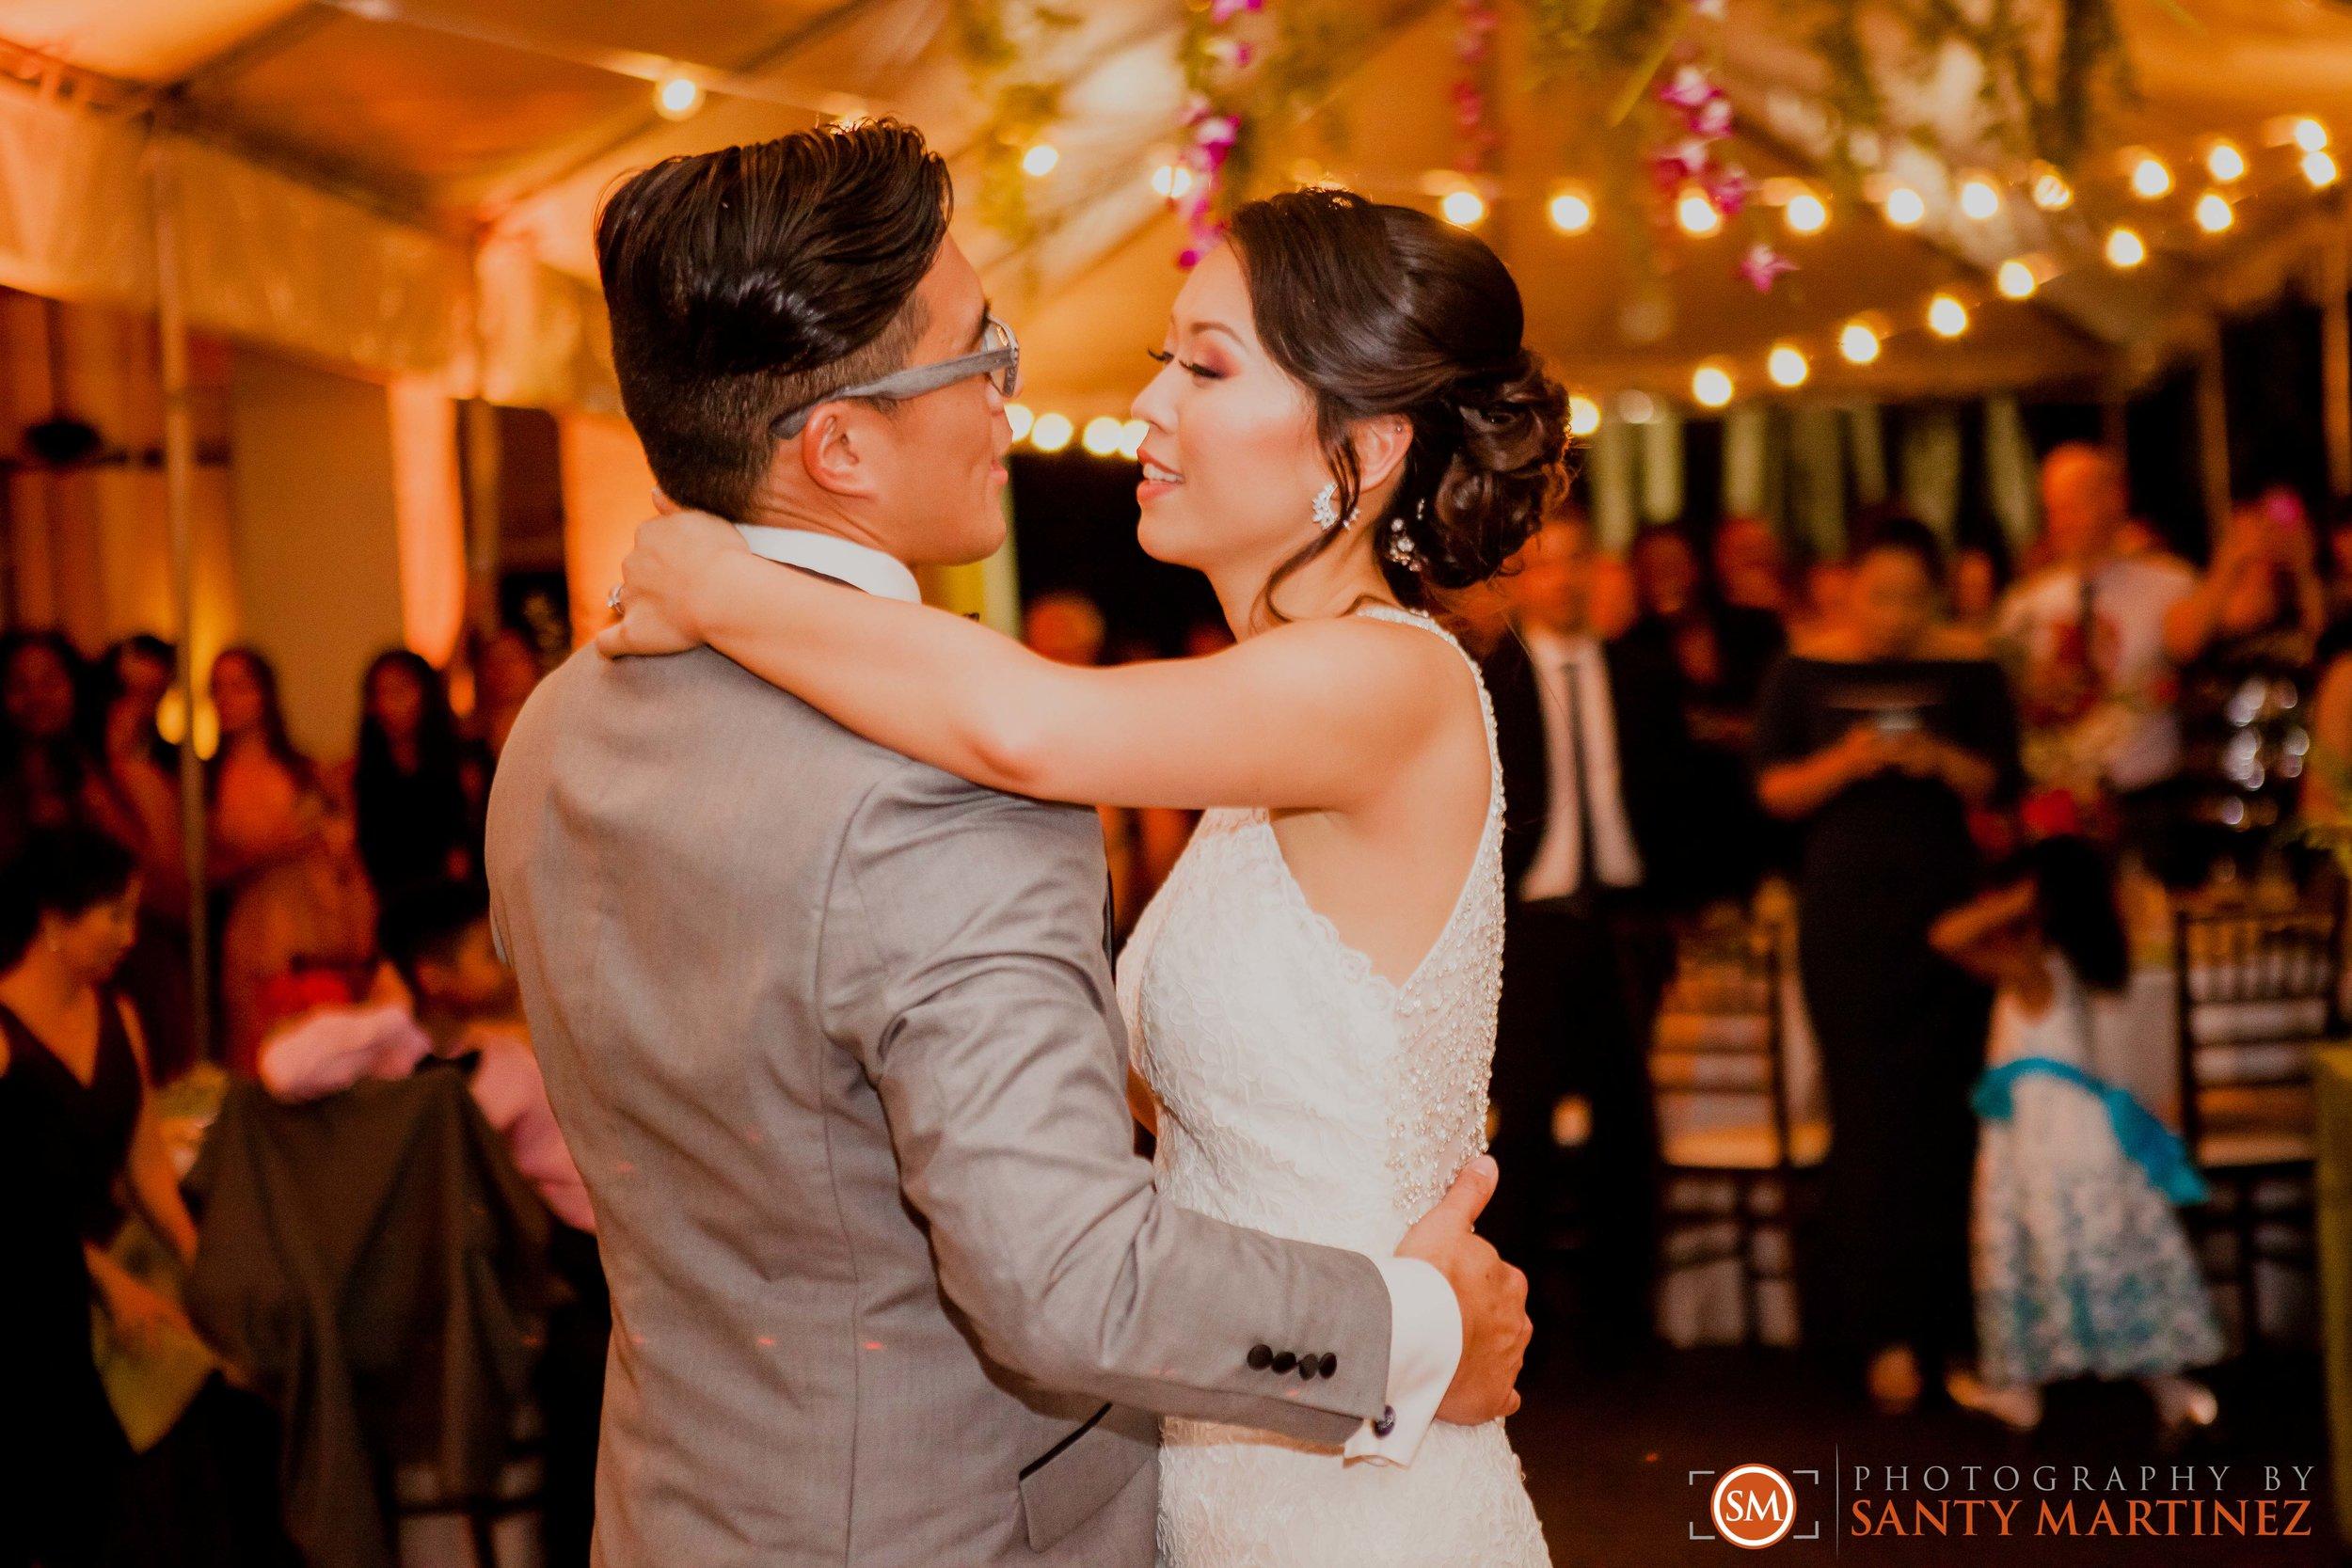 Wedding Bonnet House - Photography by Santy Martinez-40.jpg